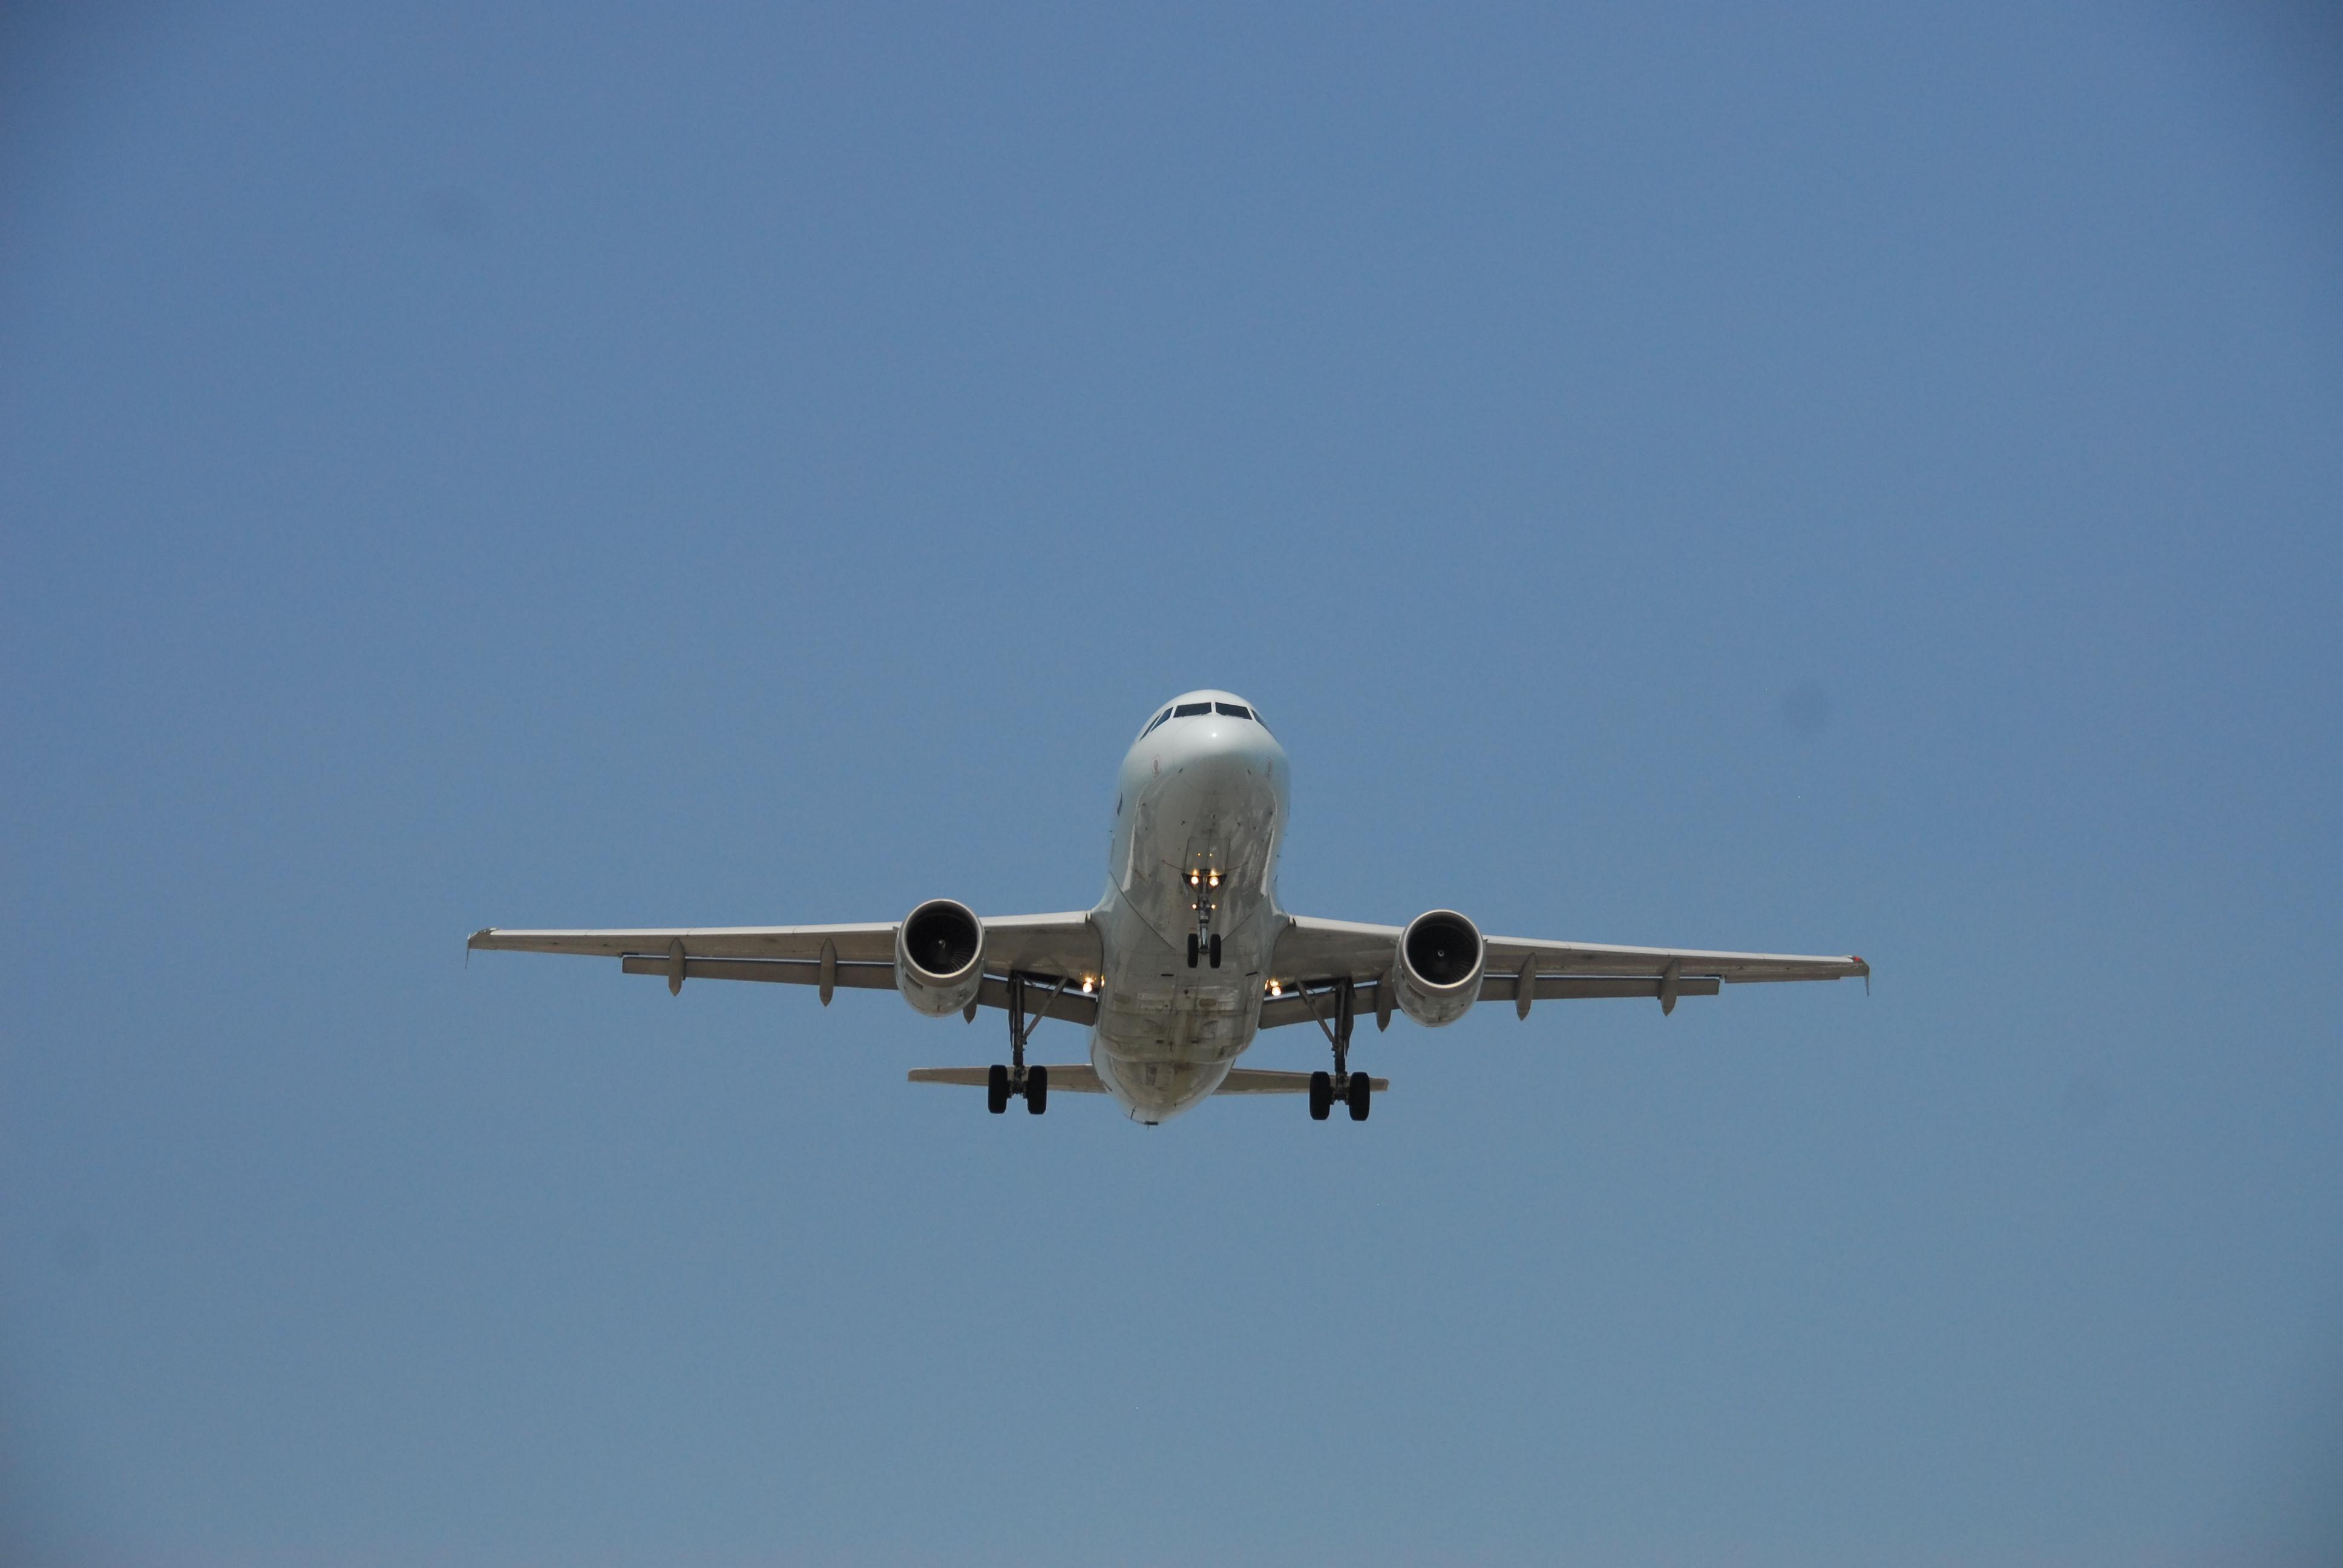 File:Air Canada Airbus A320-211 C-FFWI 209 Flight ACA1154